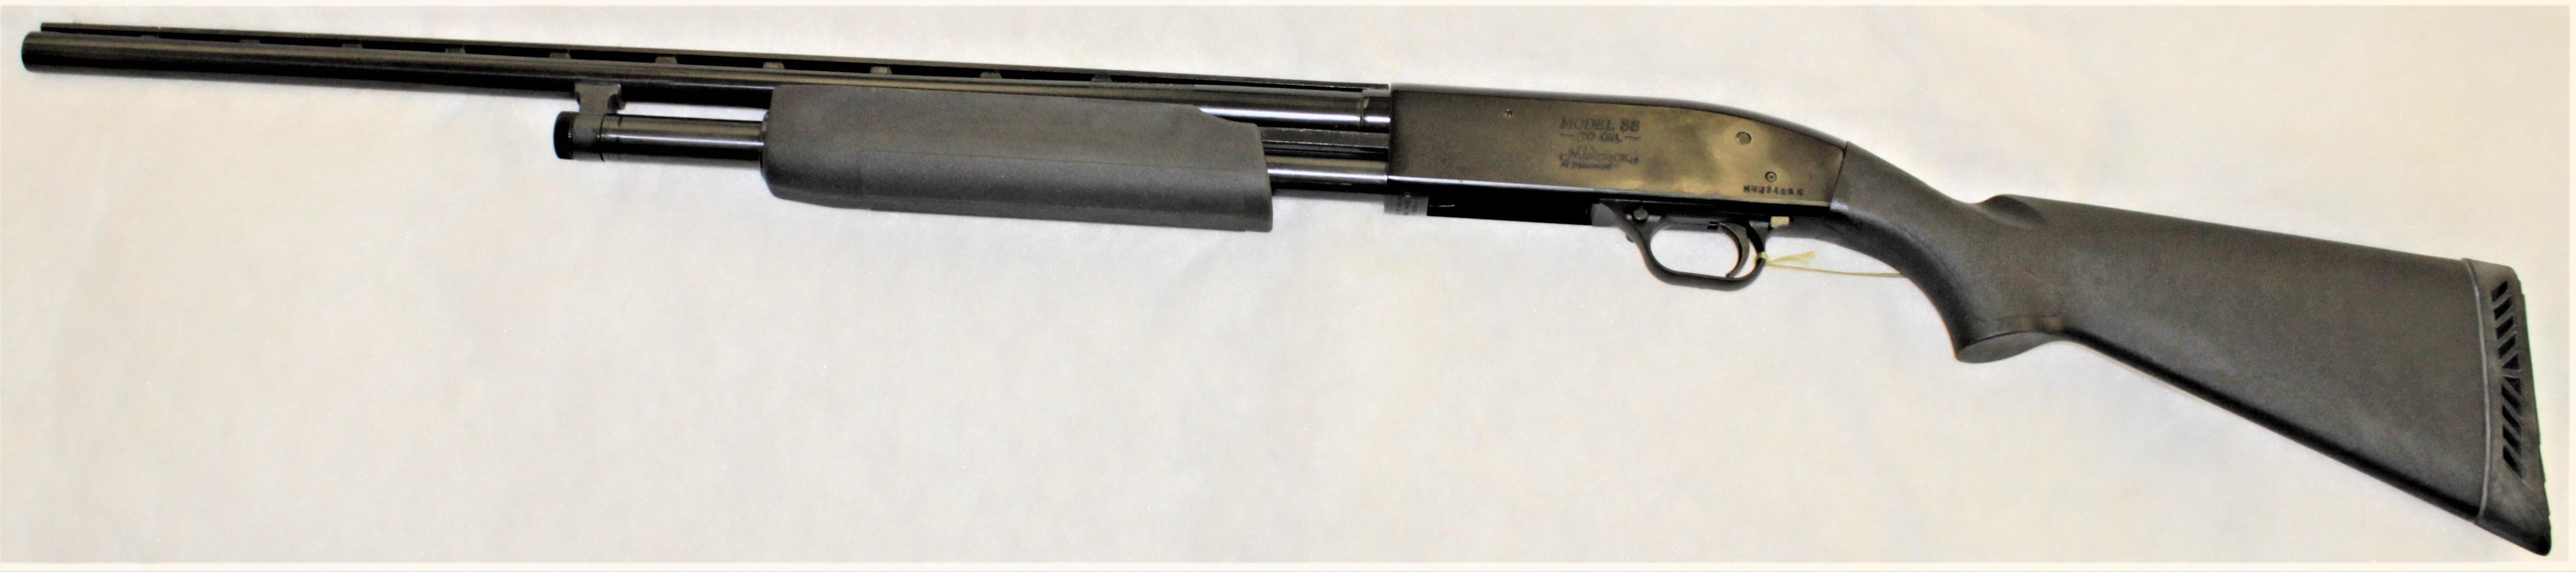 MAVERICK - MODEL 88 - SHOTGUN